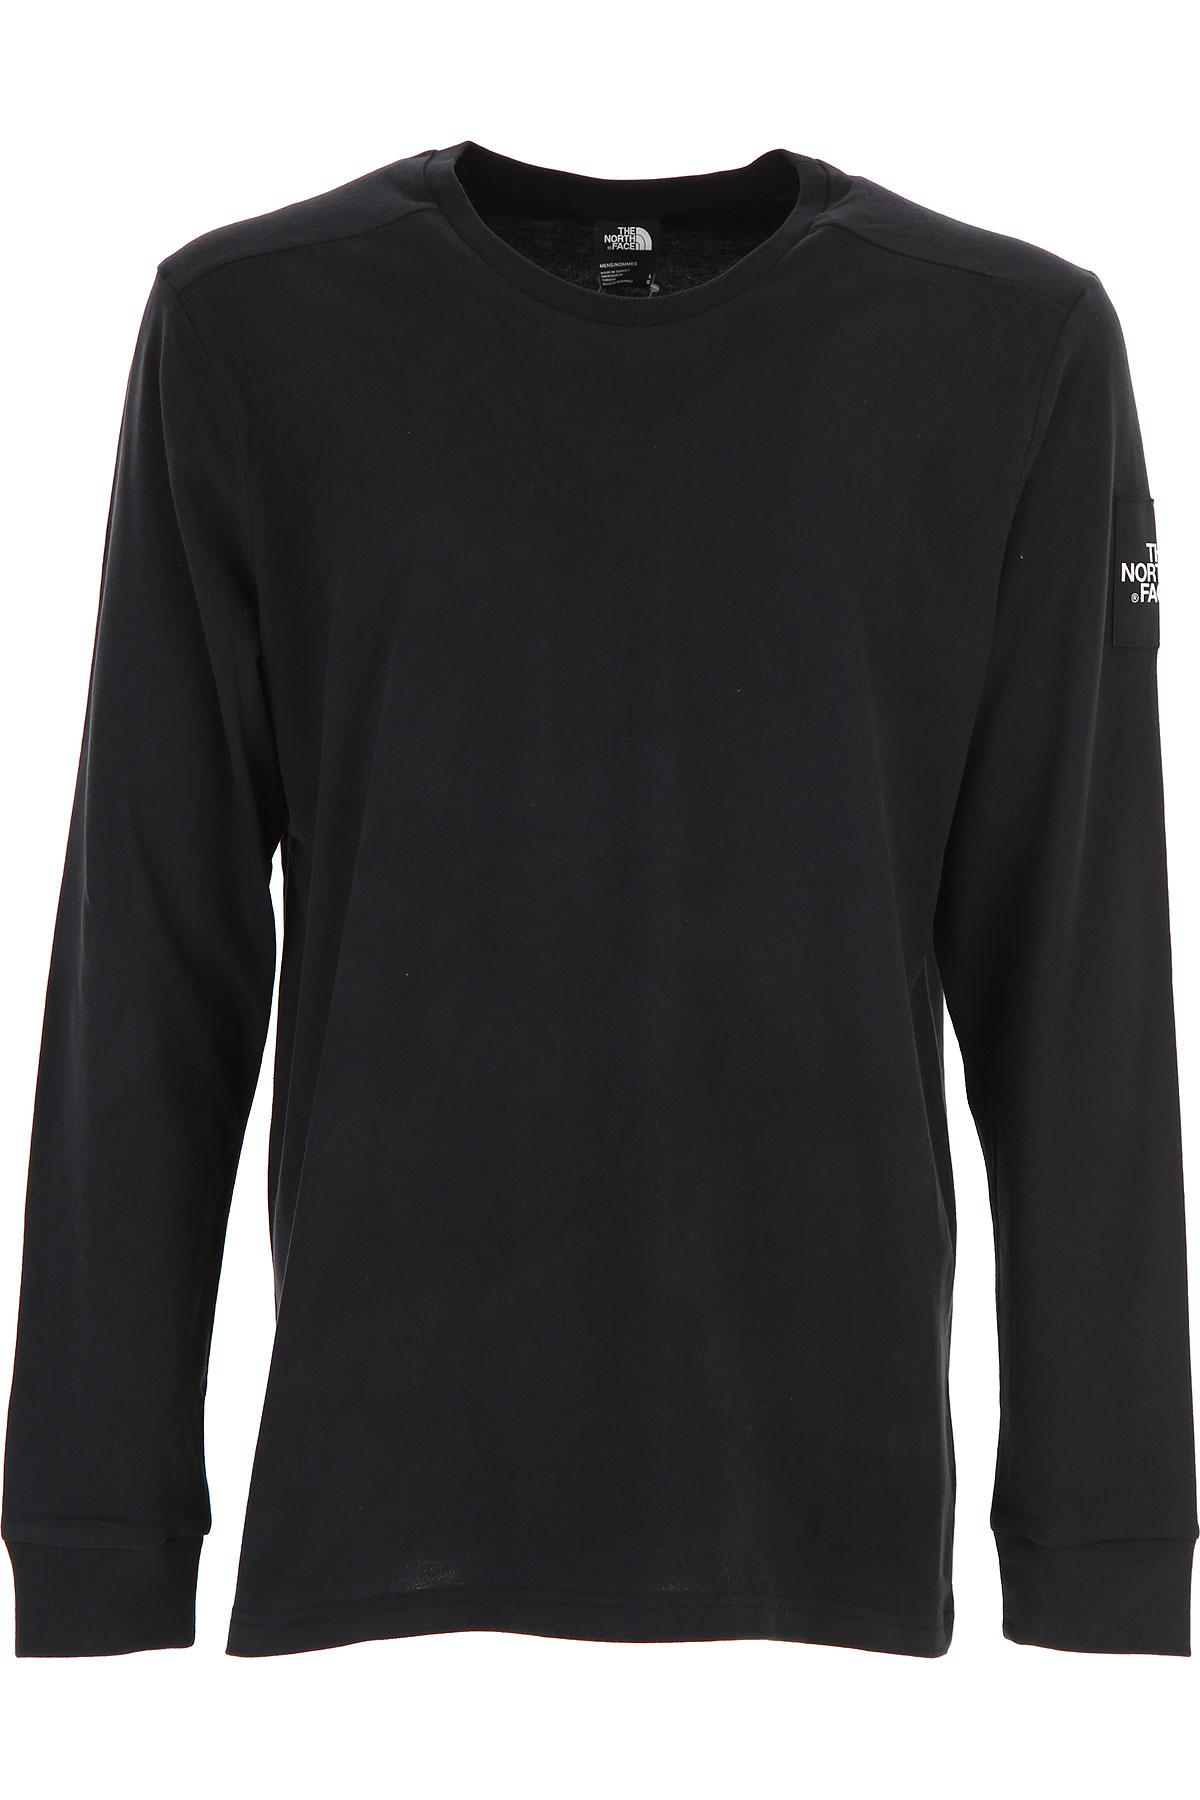 The North Face T-Shirt for Men On Sale, Black, Cotton, 2019, L M S XS